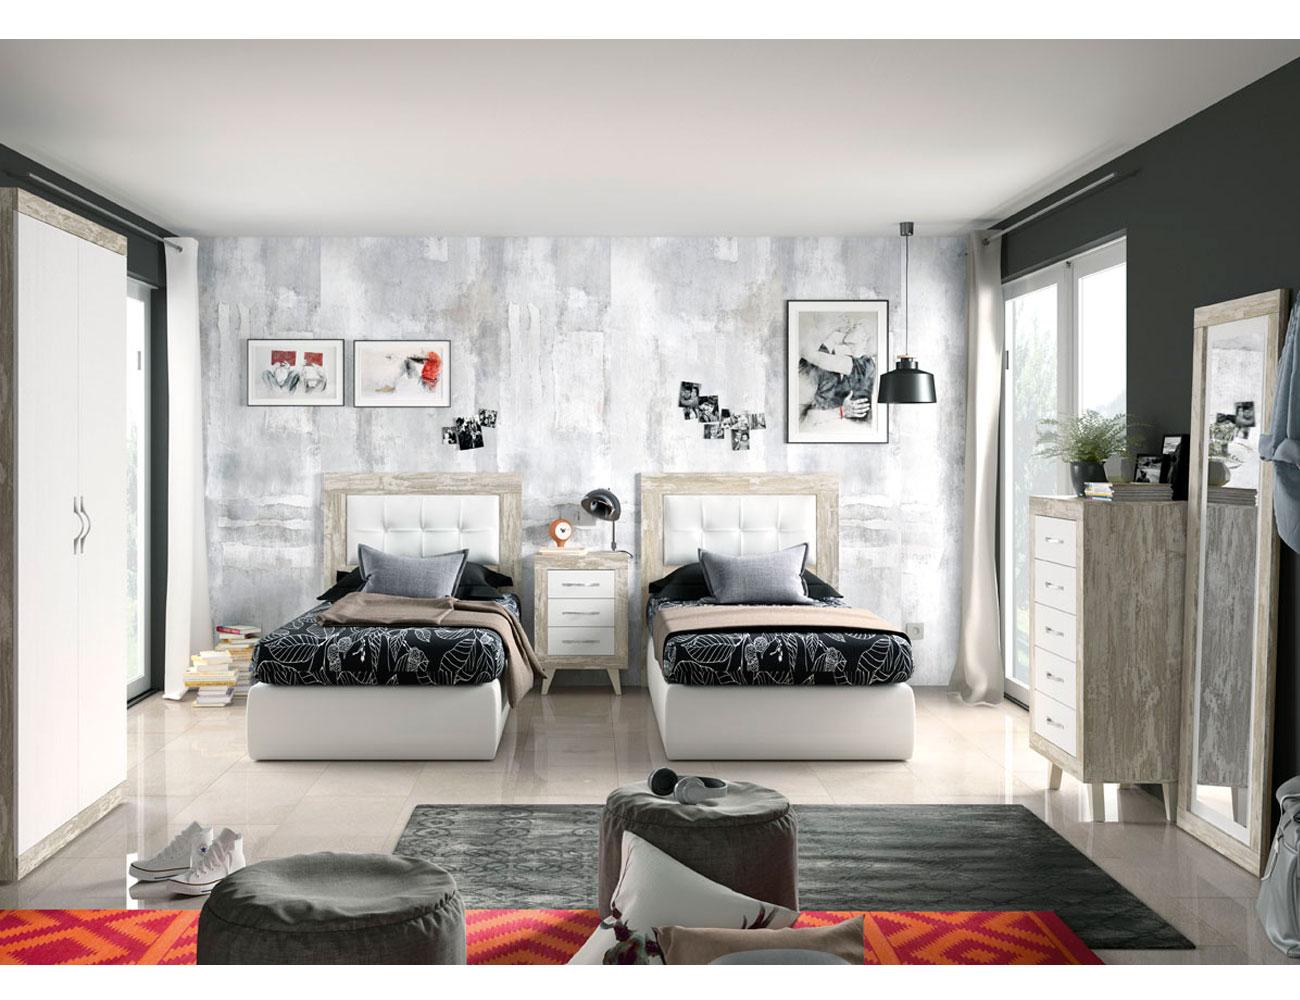 271 dormitorio juvenil vintage soul tapizado blanco